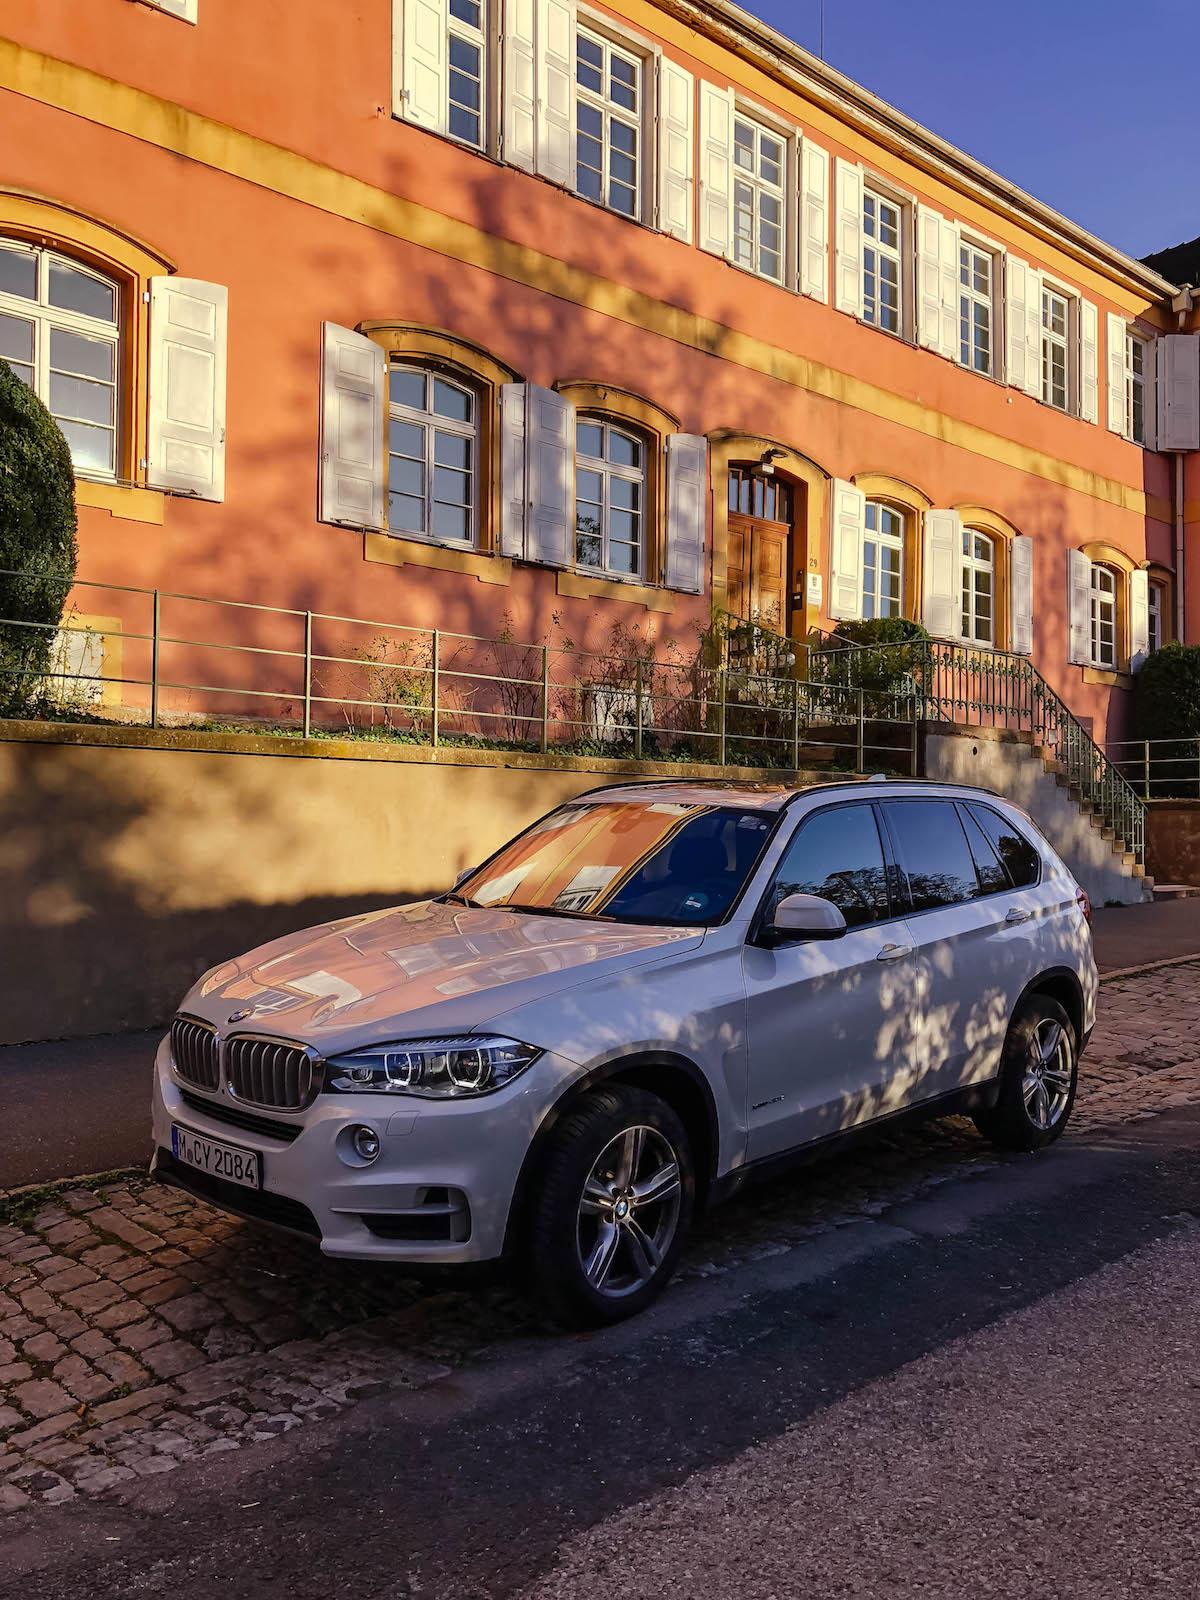 Sixt Car Rental Germany